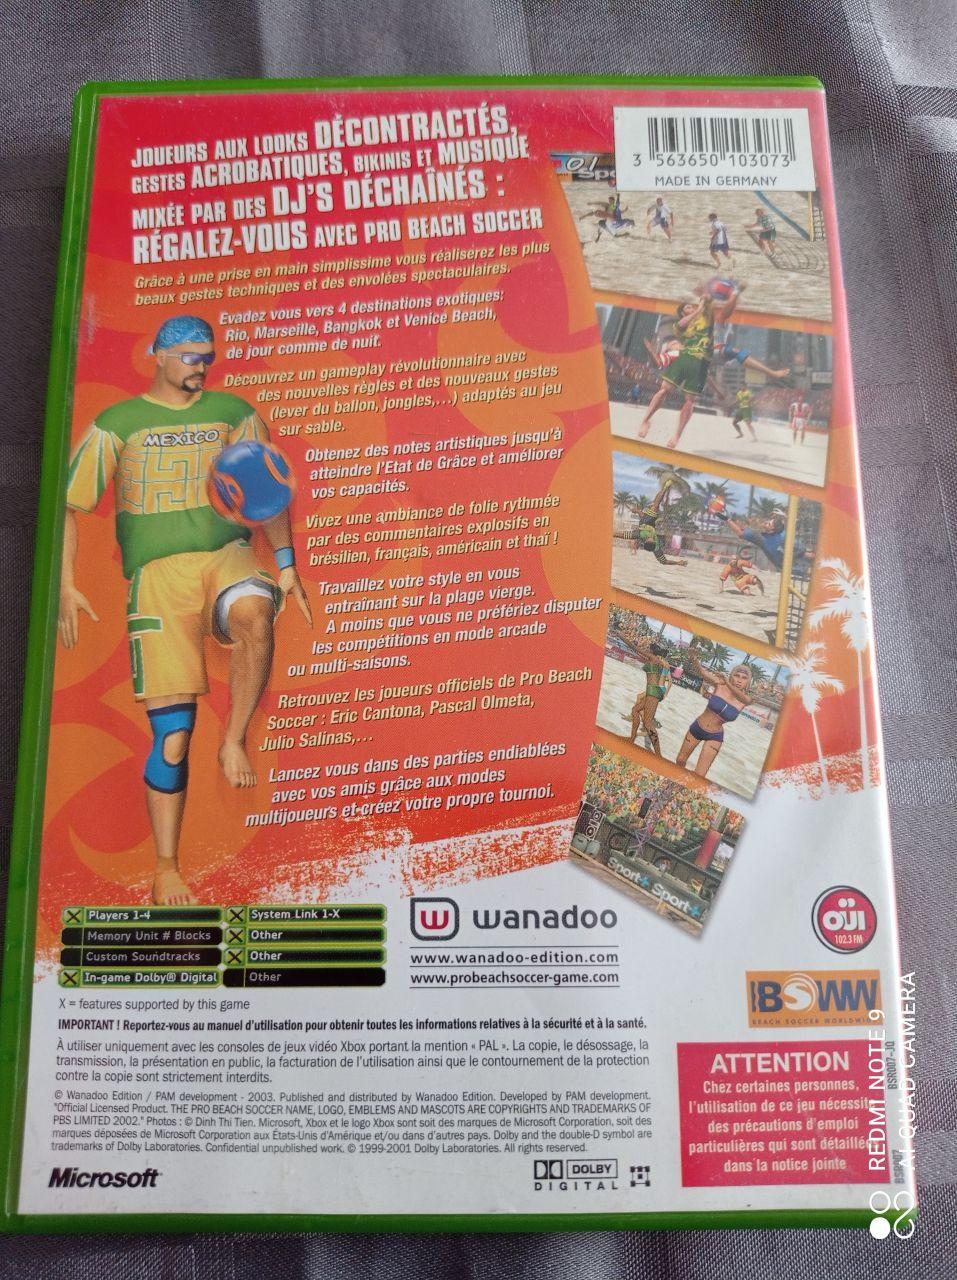 Image article Microsoft - Xbox - Pro beach soccer